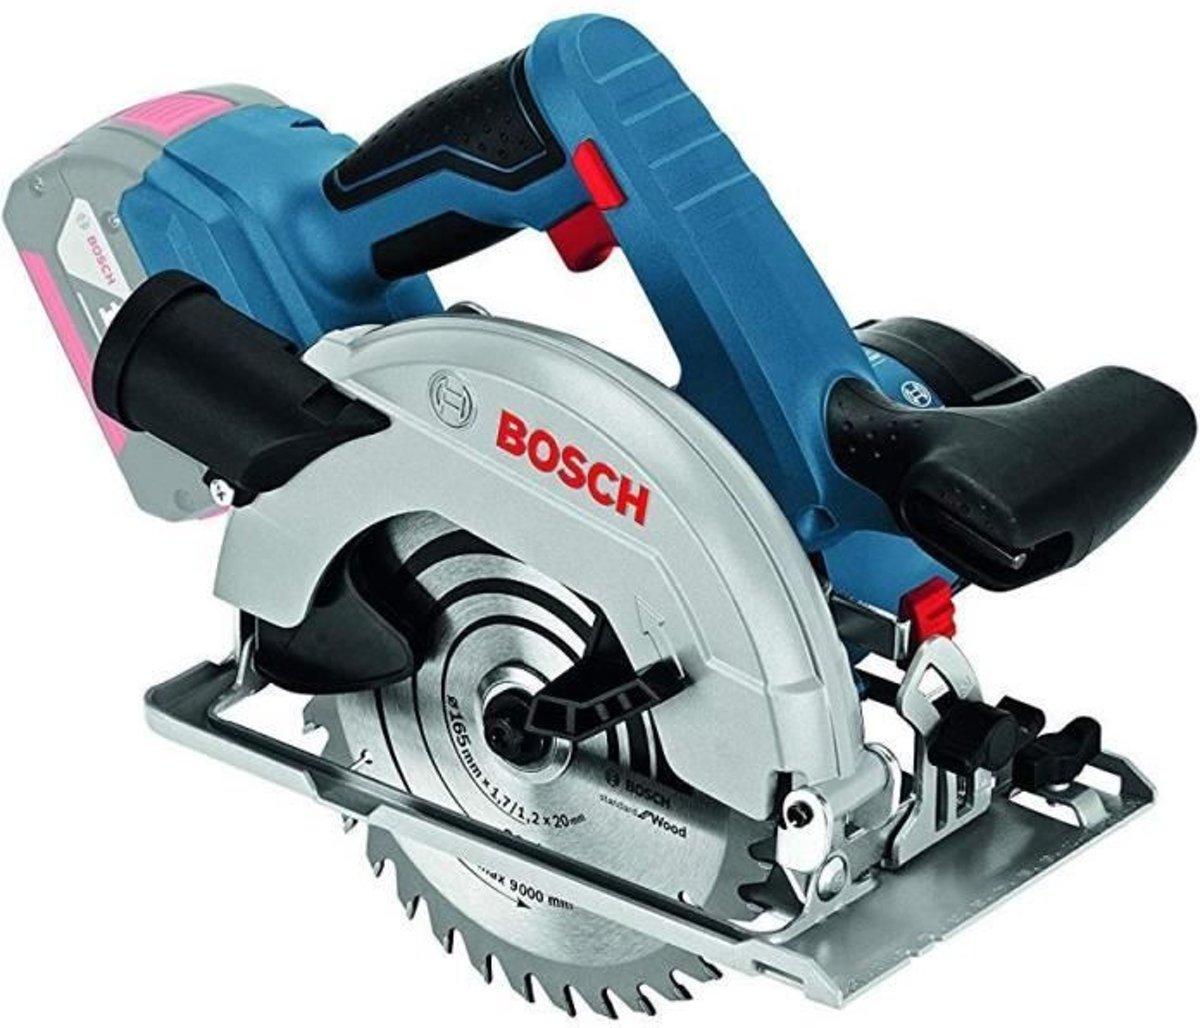 Bosch GKS 18V-57 Professional accu-cirkelzaag (exclusief accu) kopen